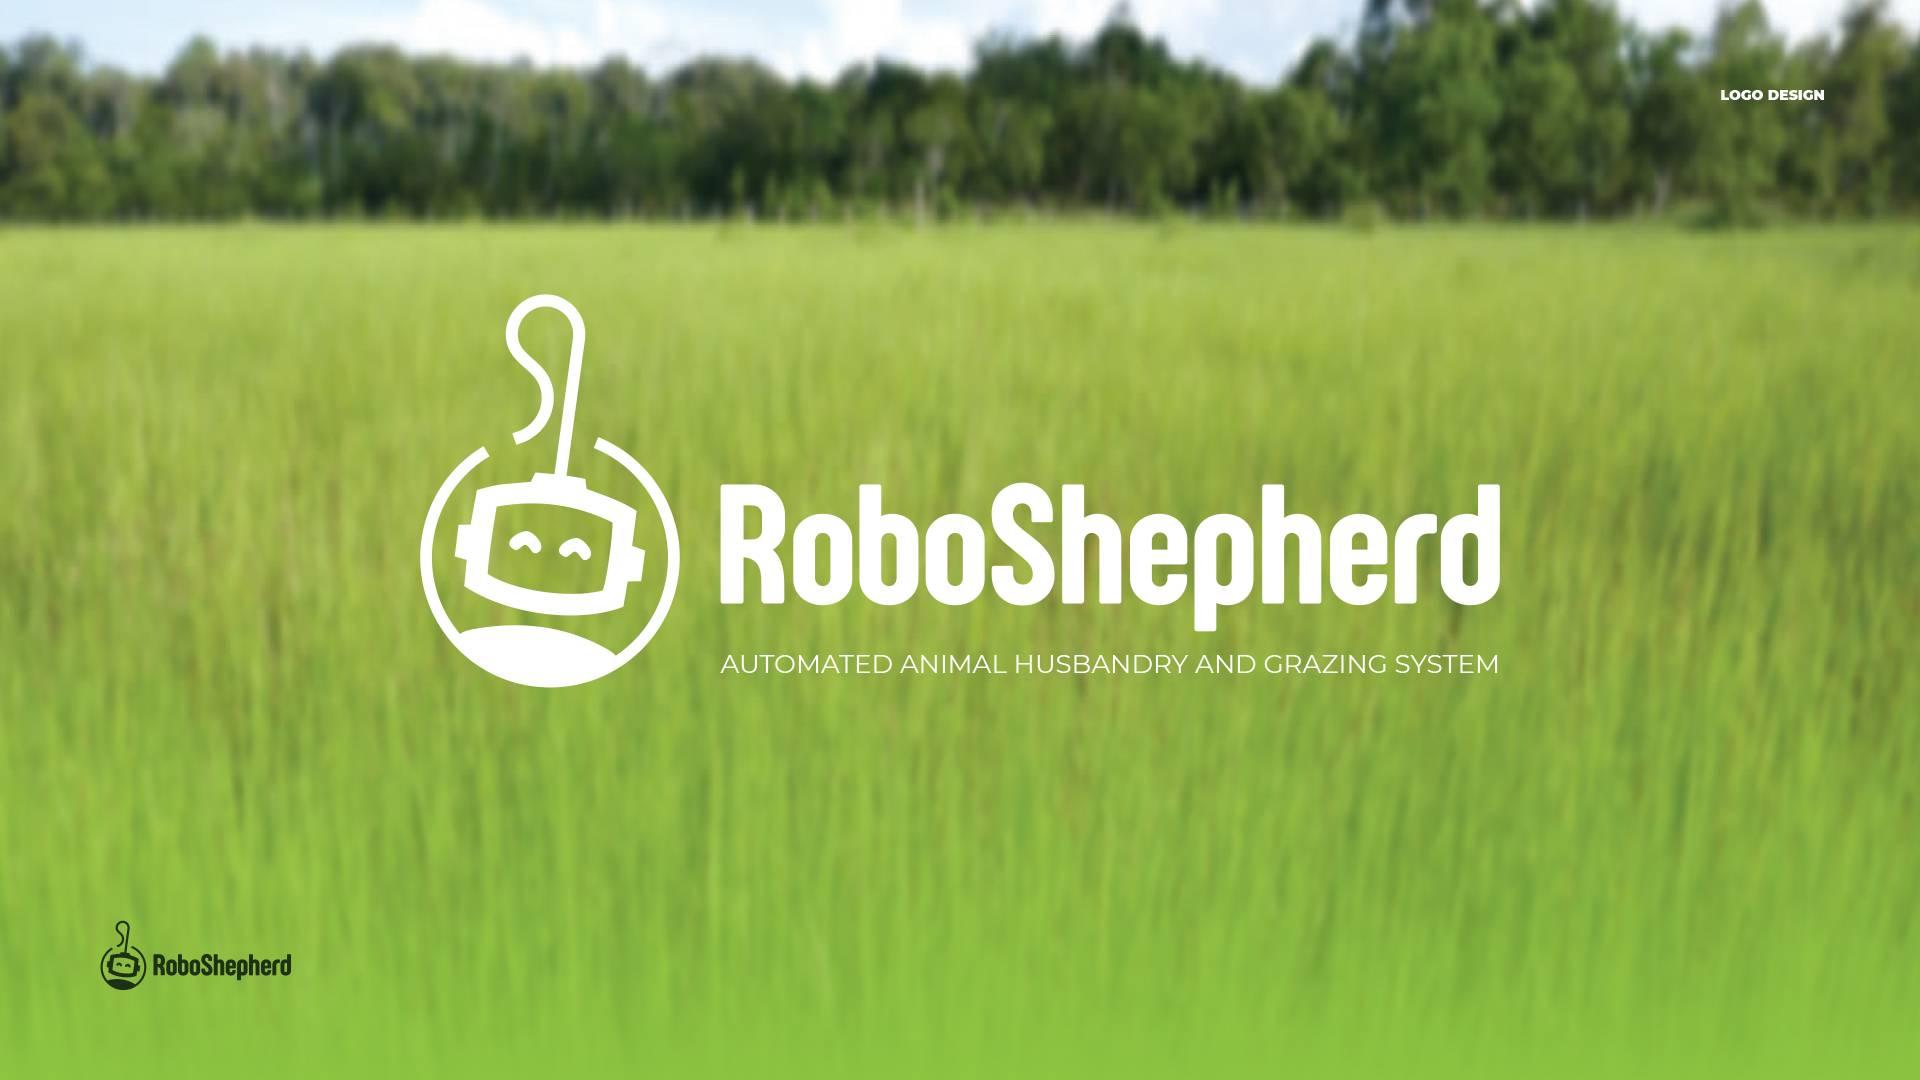 RoboShepherd-dizajn-1